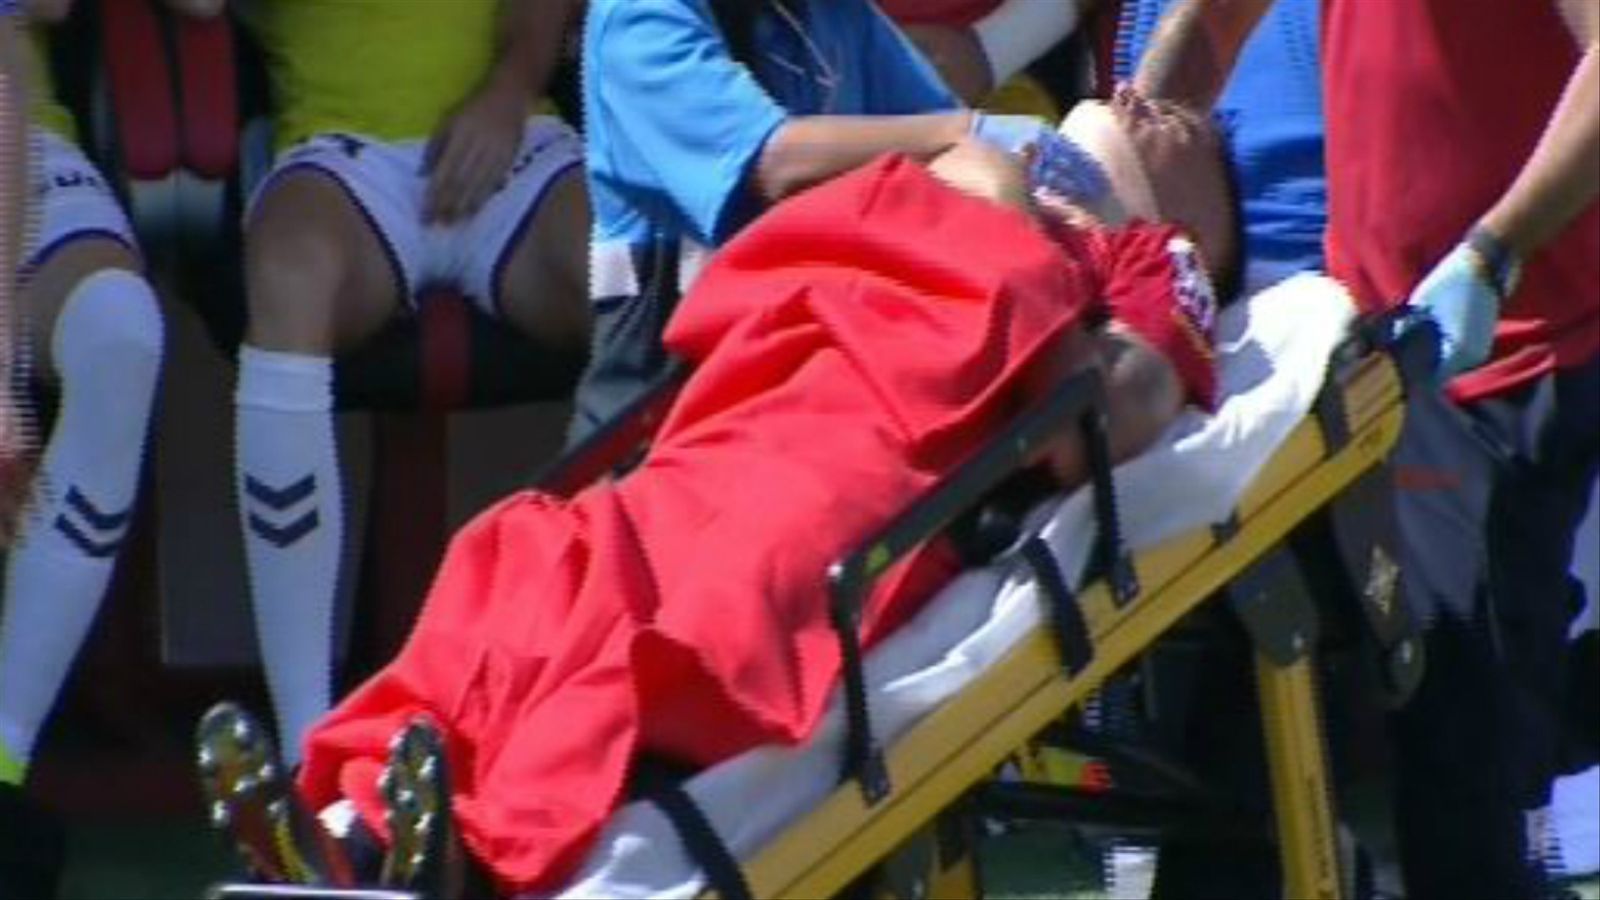 Xisco Campos pateix un traumatisme cranioencefàlic